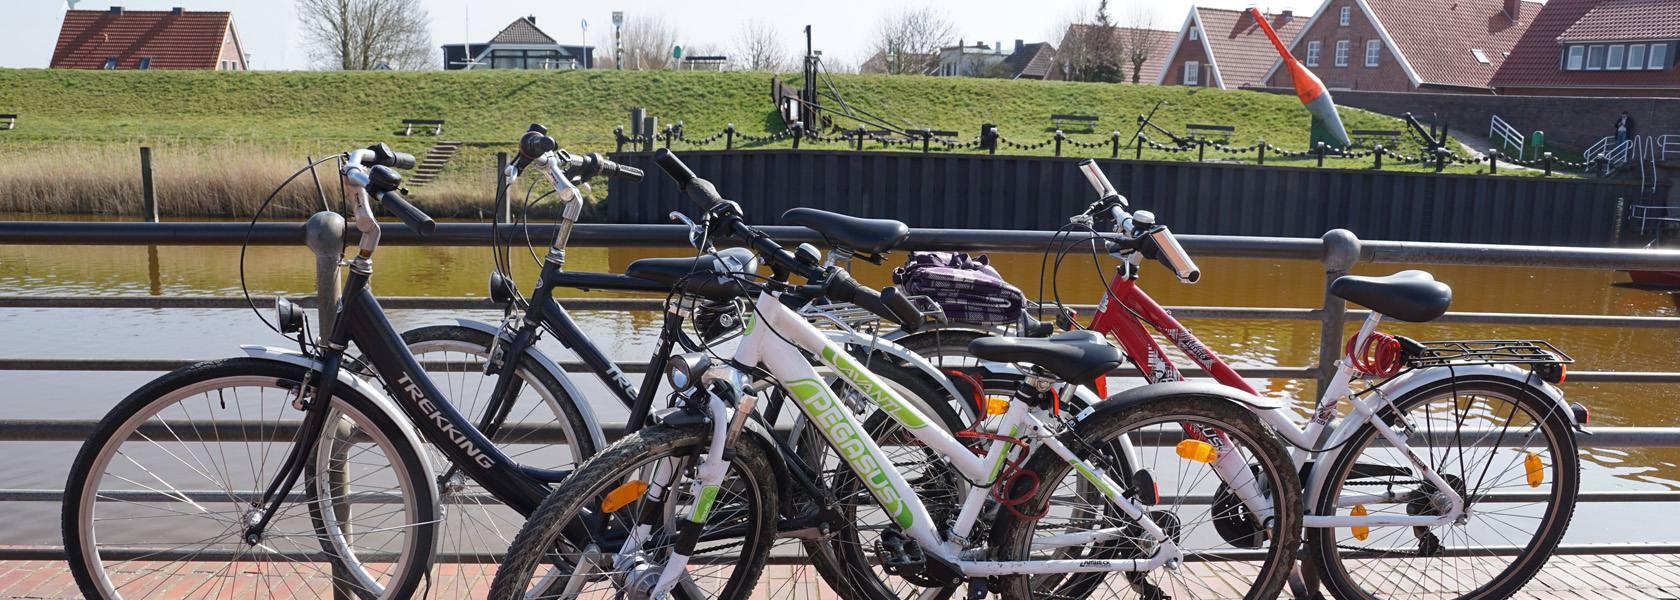 Fahrräder in Hooksiel, © Die Nordsee GmbH, Jantje Olchers